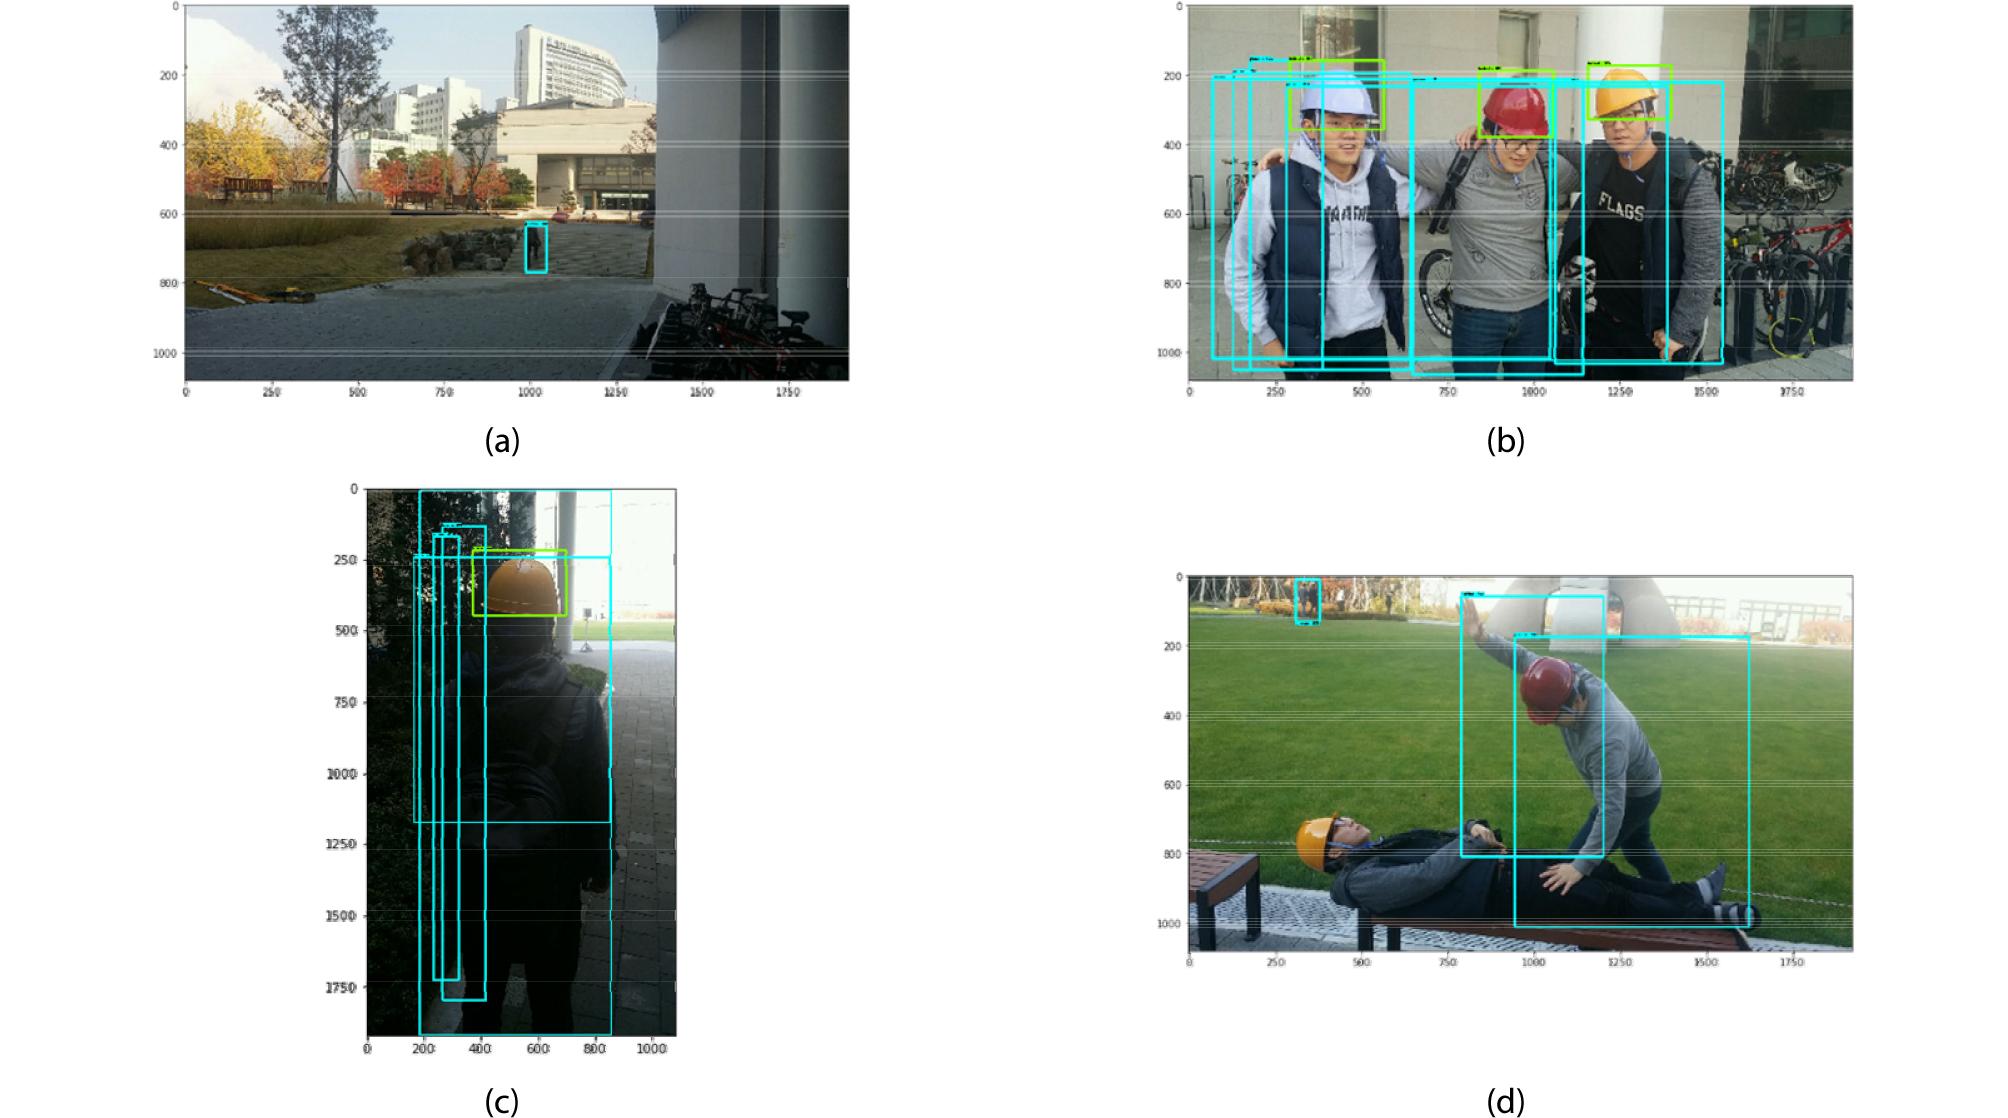 http://static.apub.kr/journalsite/sites/ksce/2019-039-03/N0110390304/images/Figure_KSCE_39_3_04_F7.jpg